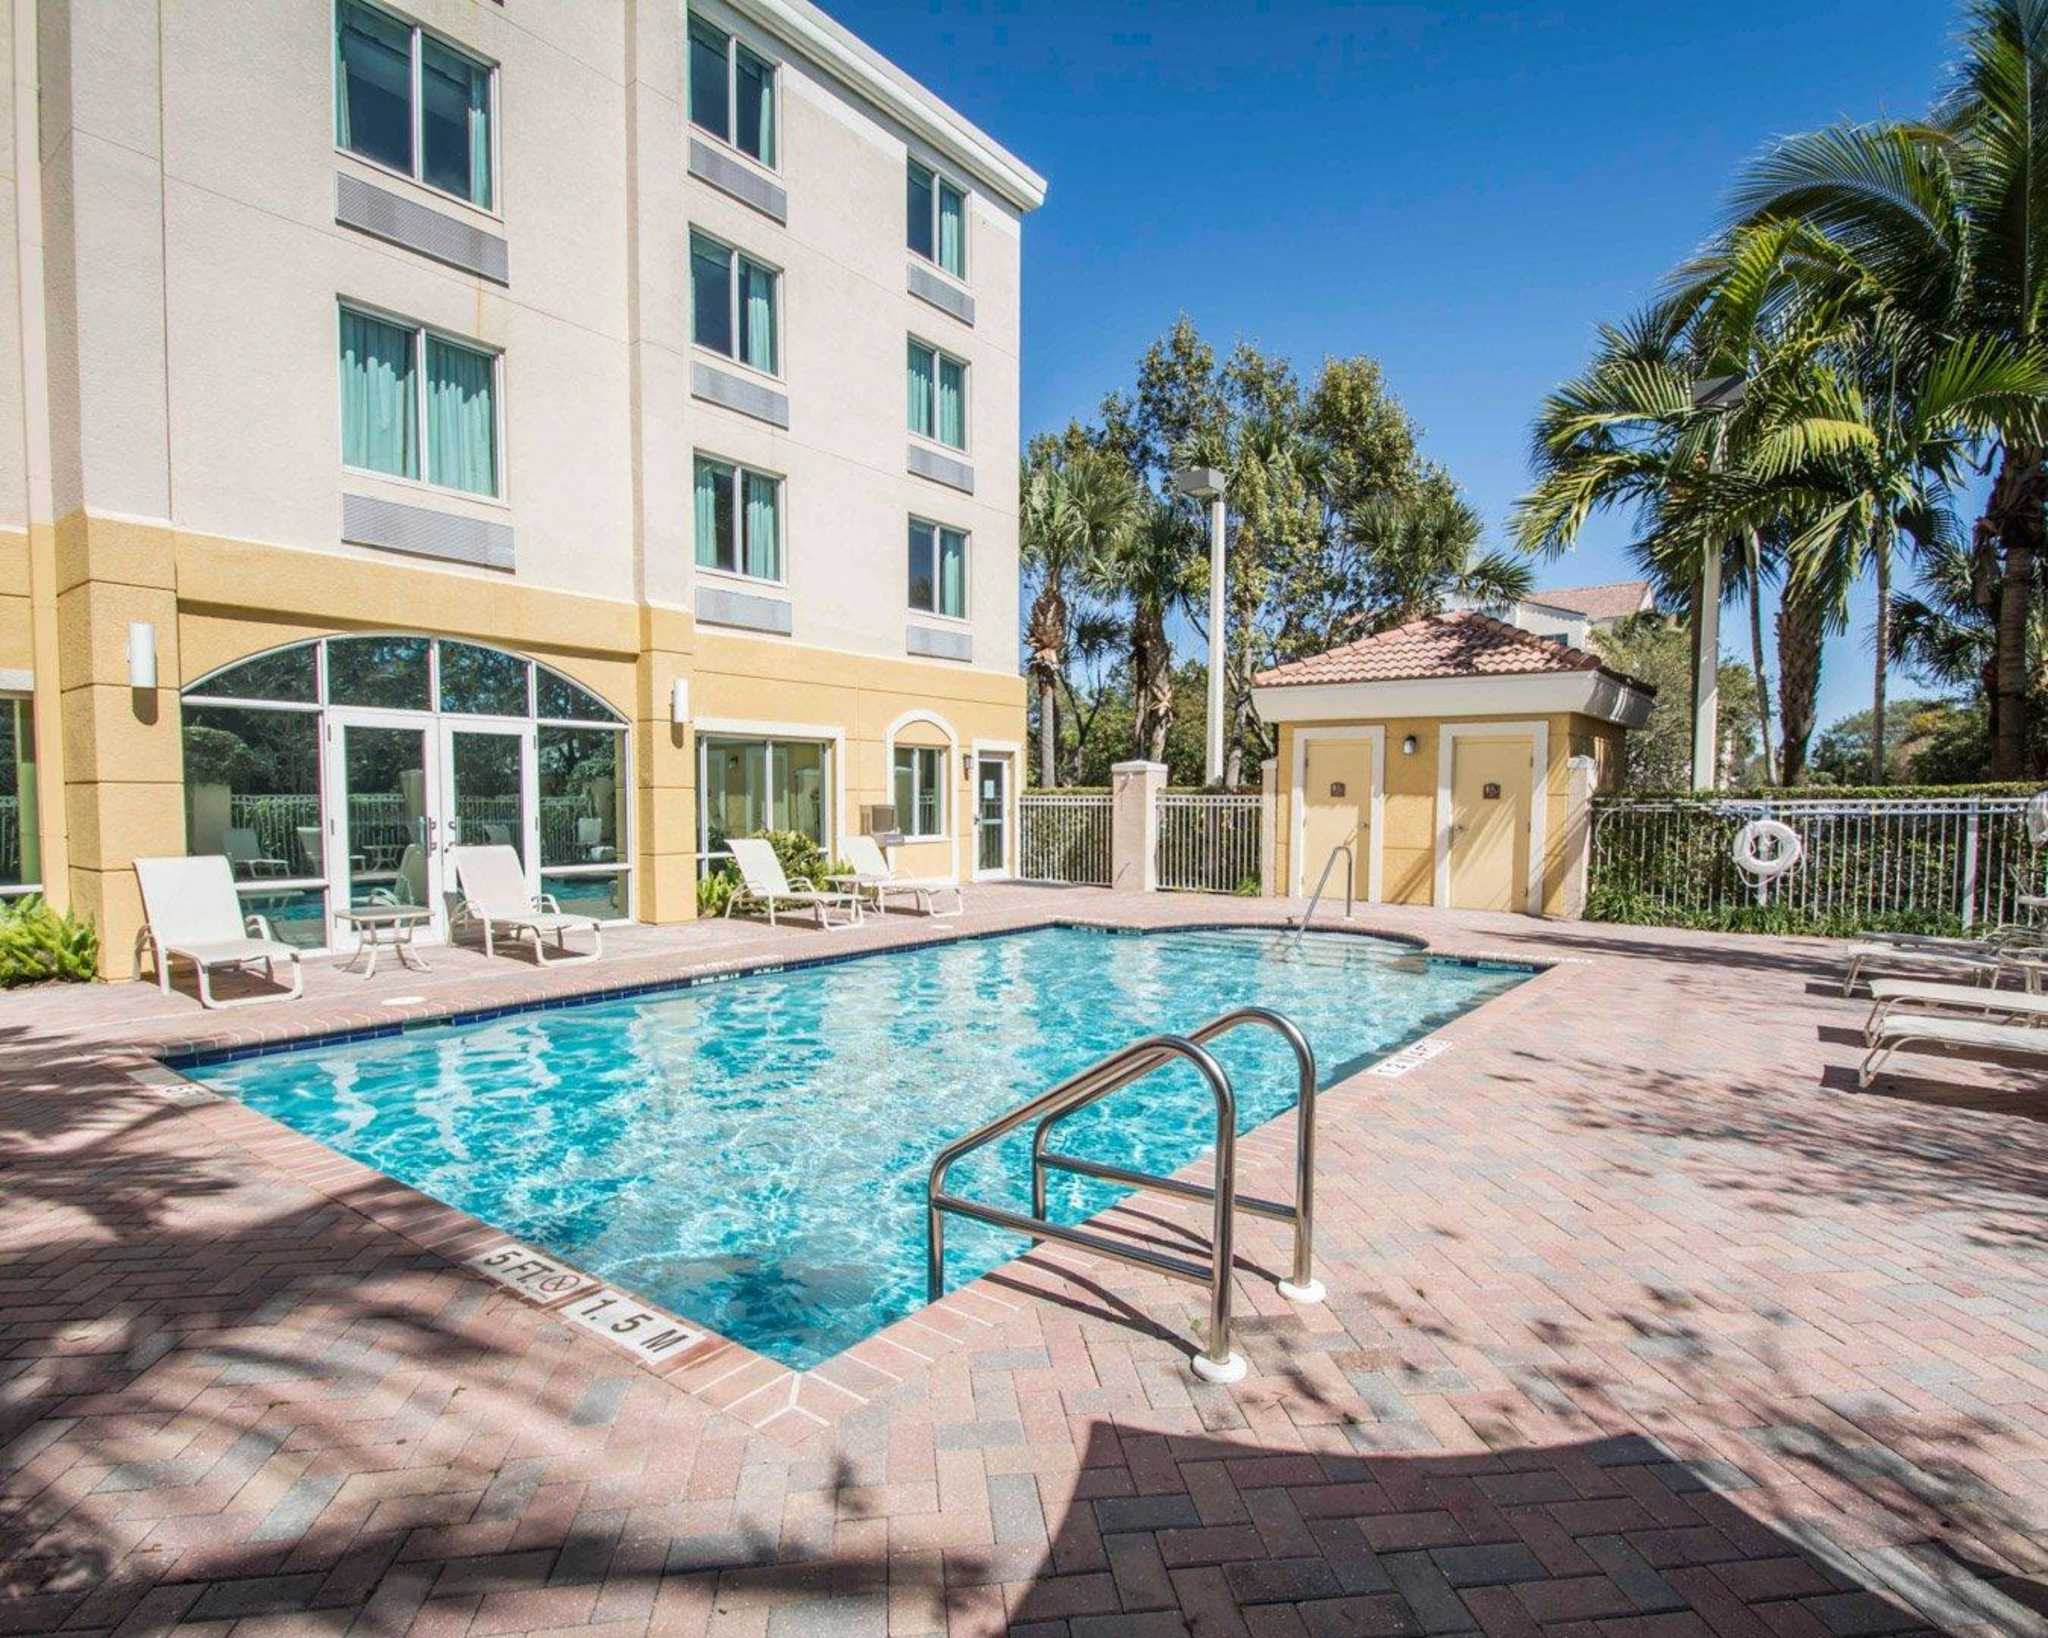 Comfort Inn Amp Suites Jupiter Fl Company Profile